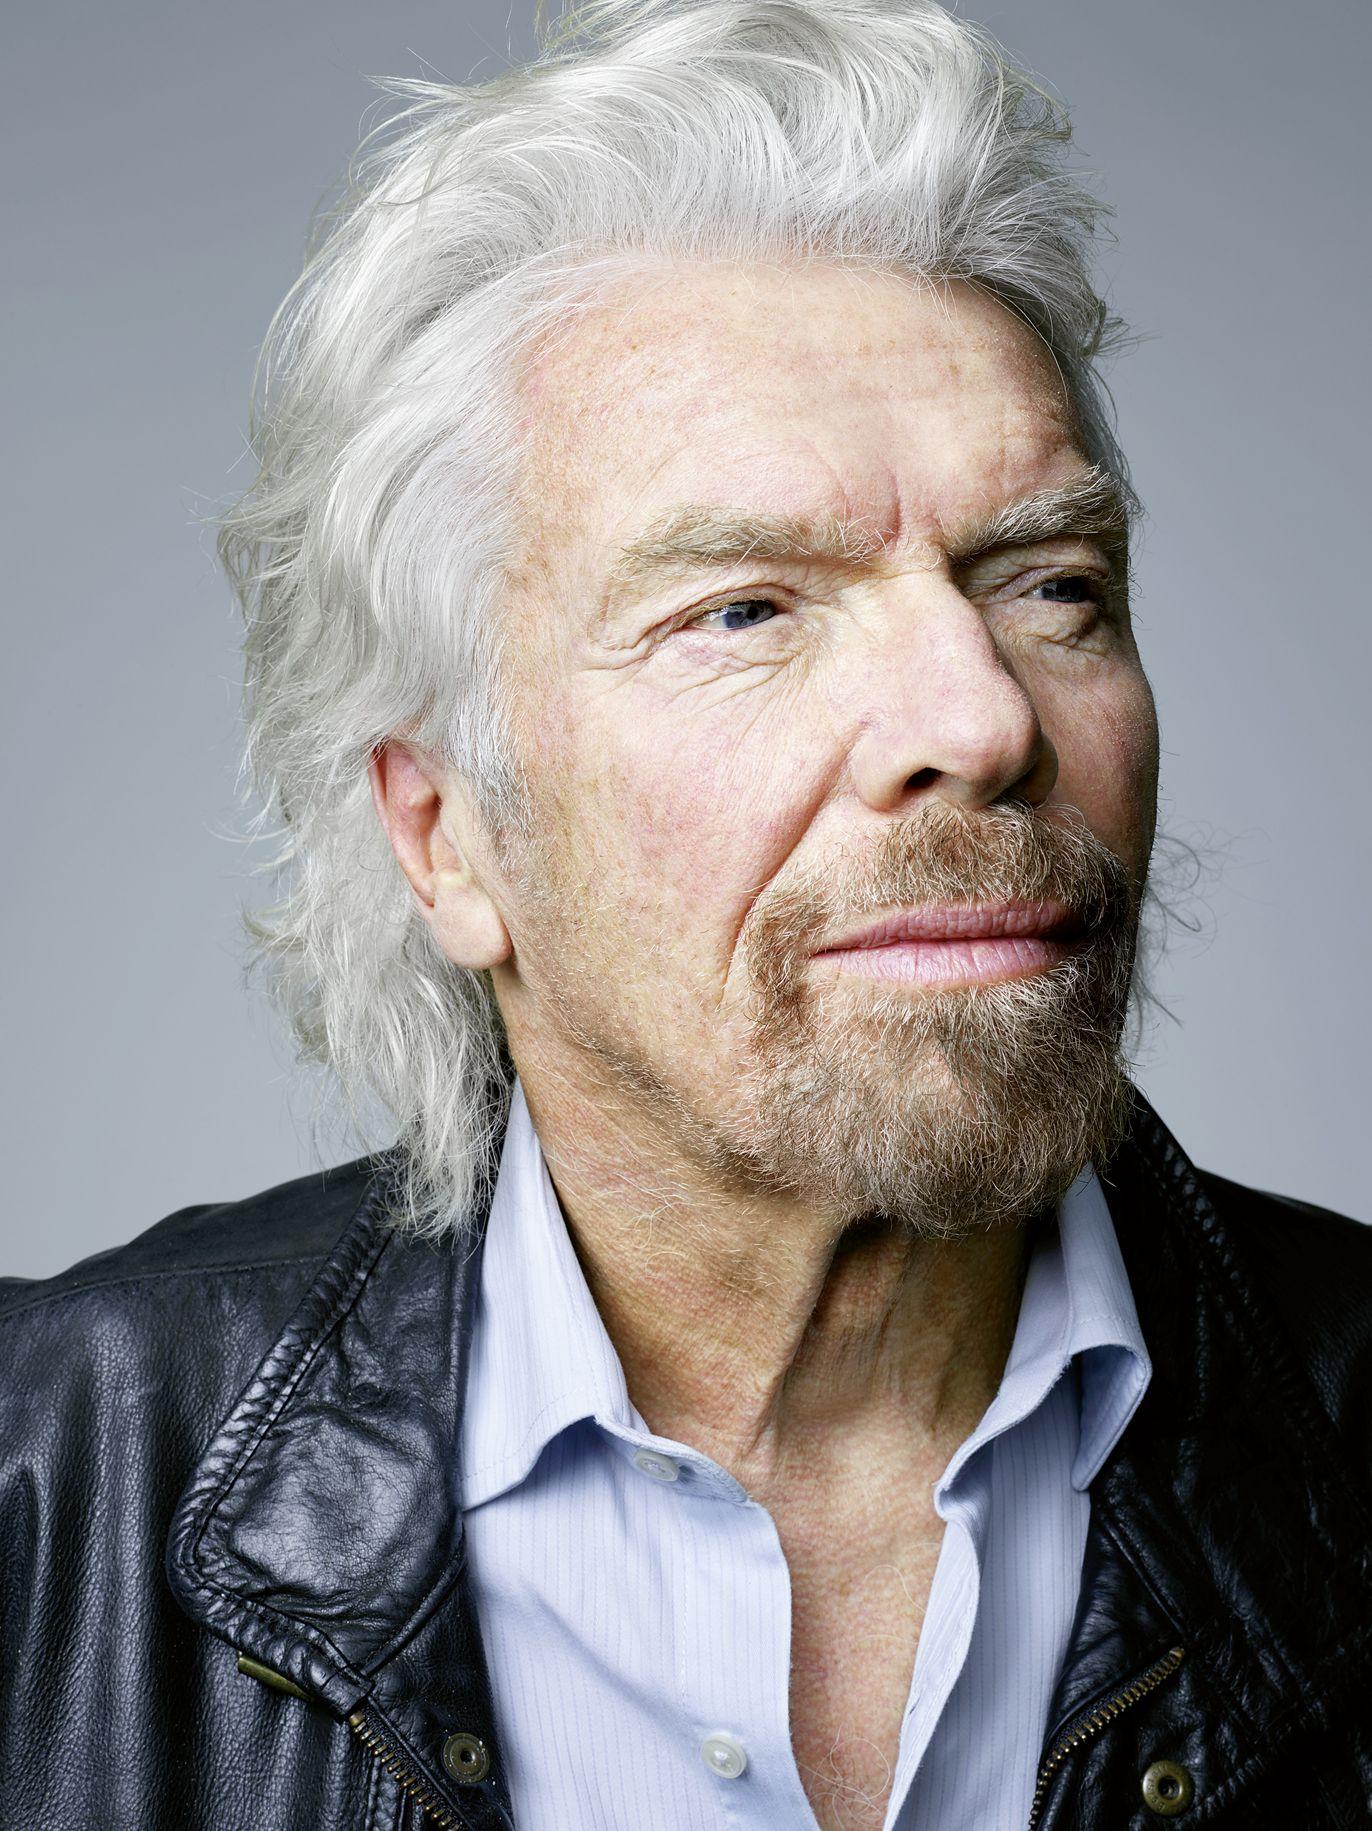 Richard Branson: Έχω κάνει μερικά από τα πιο τρελά, ανισόρροπα πράγματα